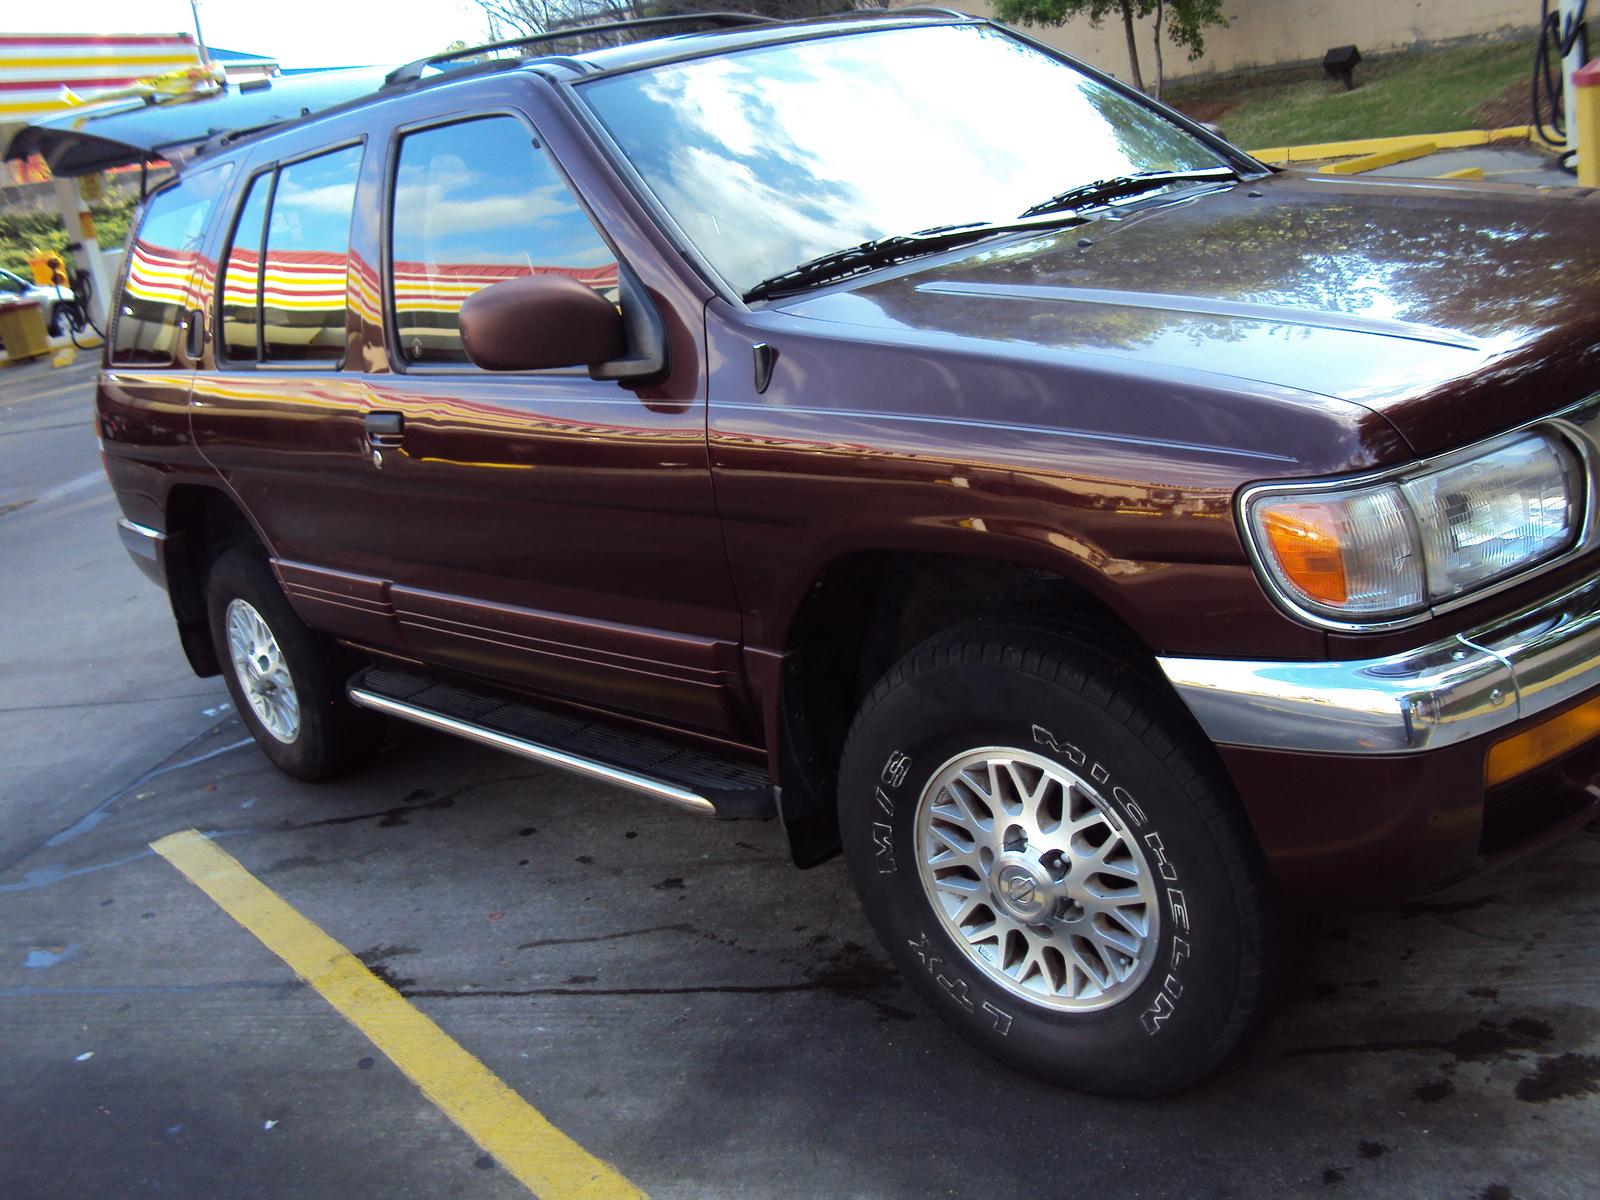 1997 Nissan Pathfinder Pictures Cargurus